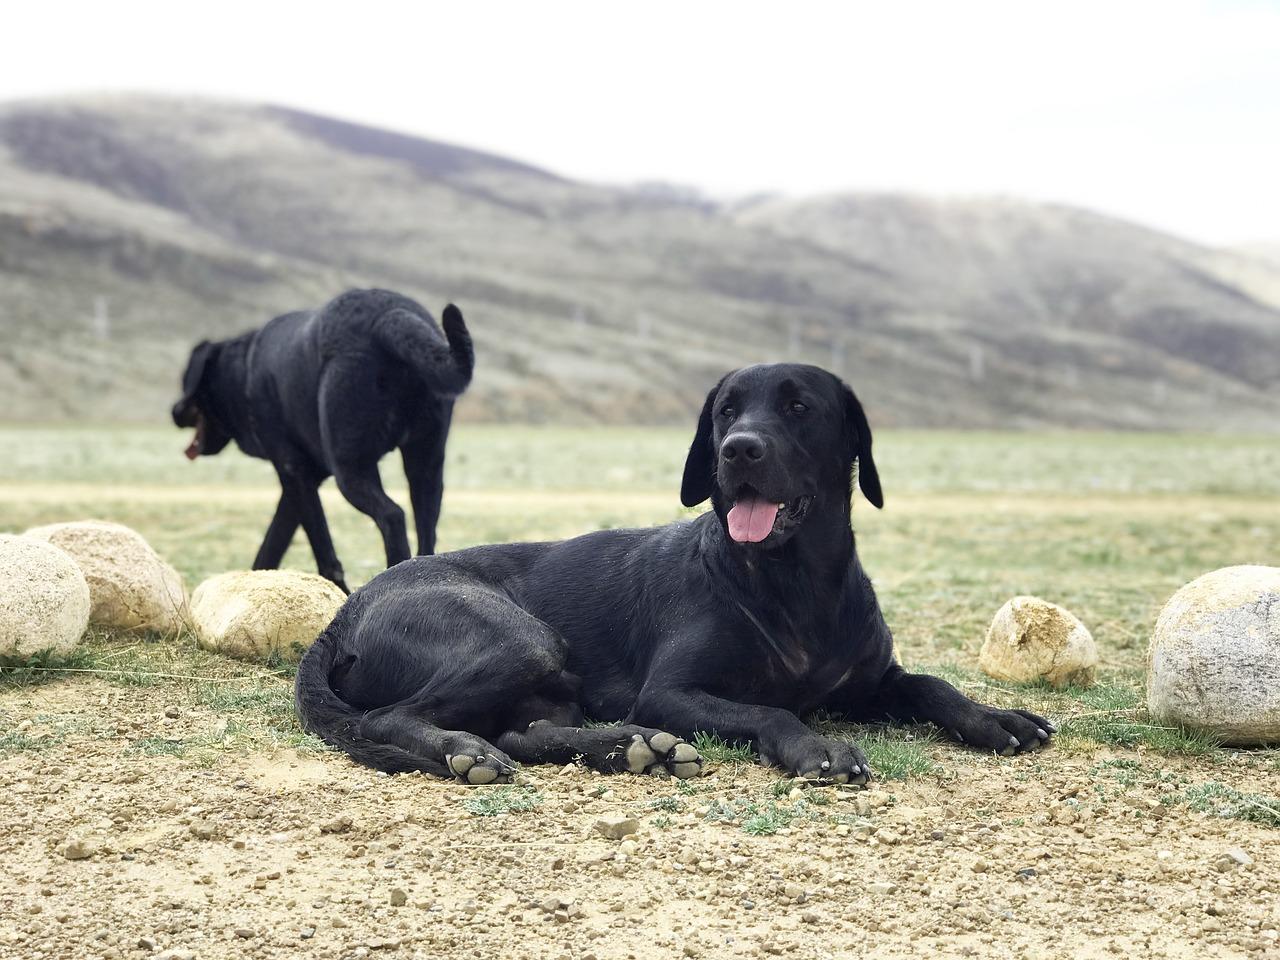 the black dog, labrador, prairie